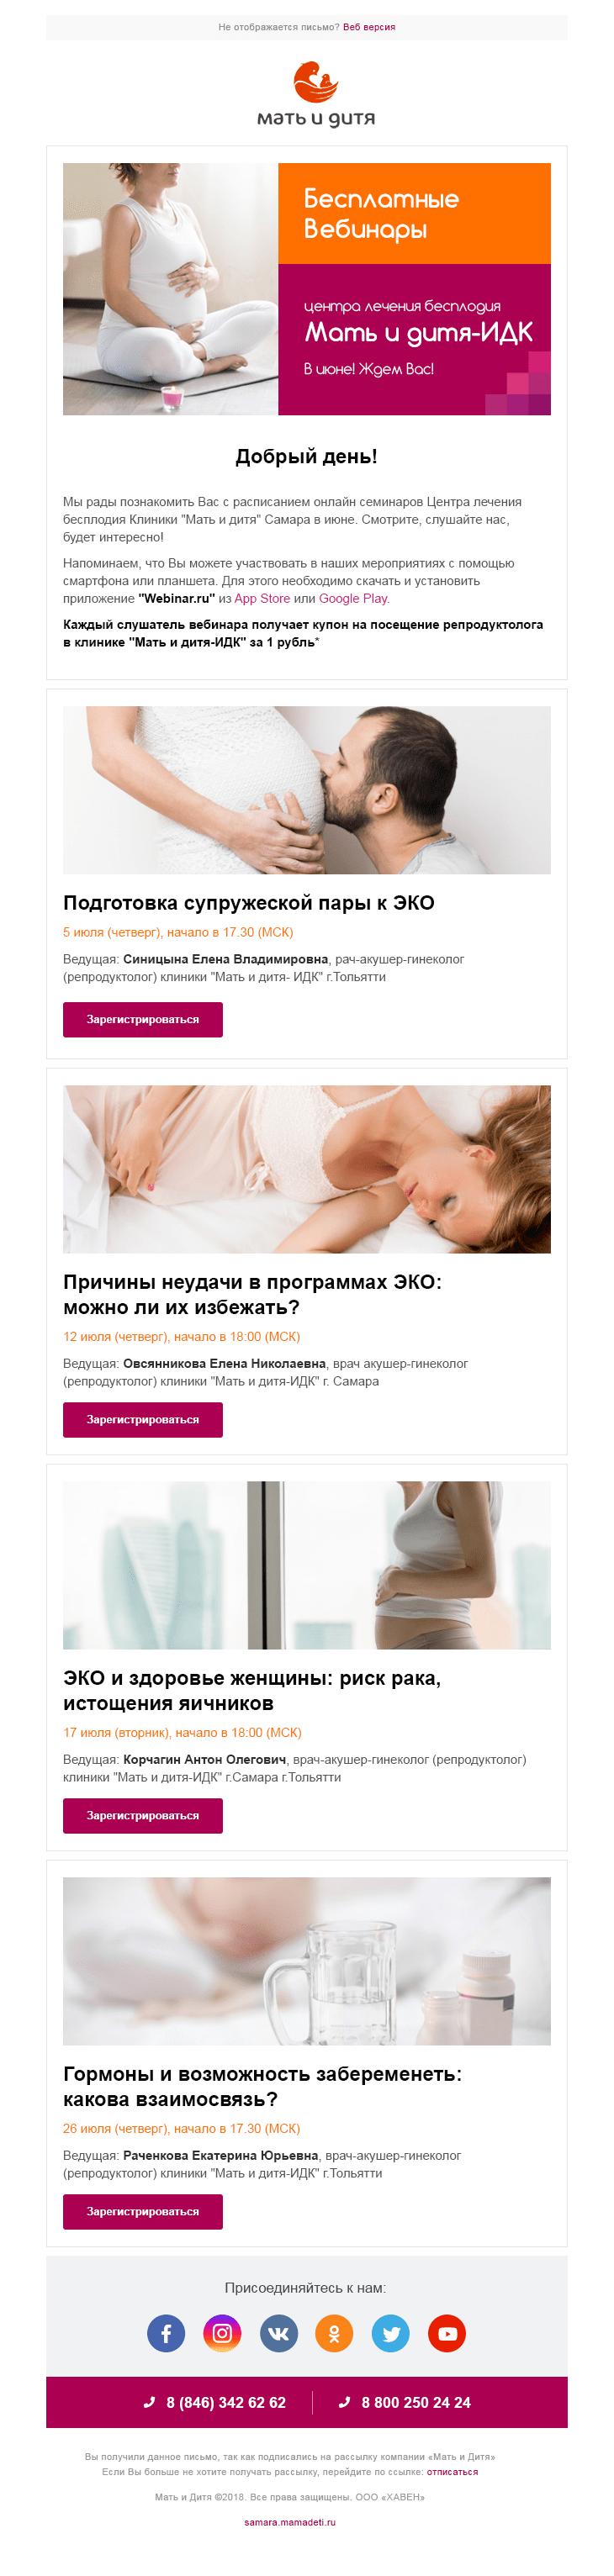 Дайджест мероприятий от центра лечения бесплодия